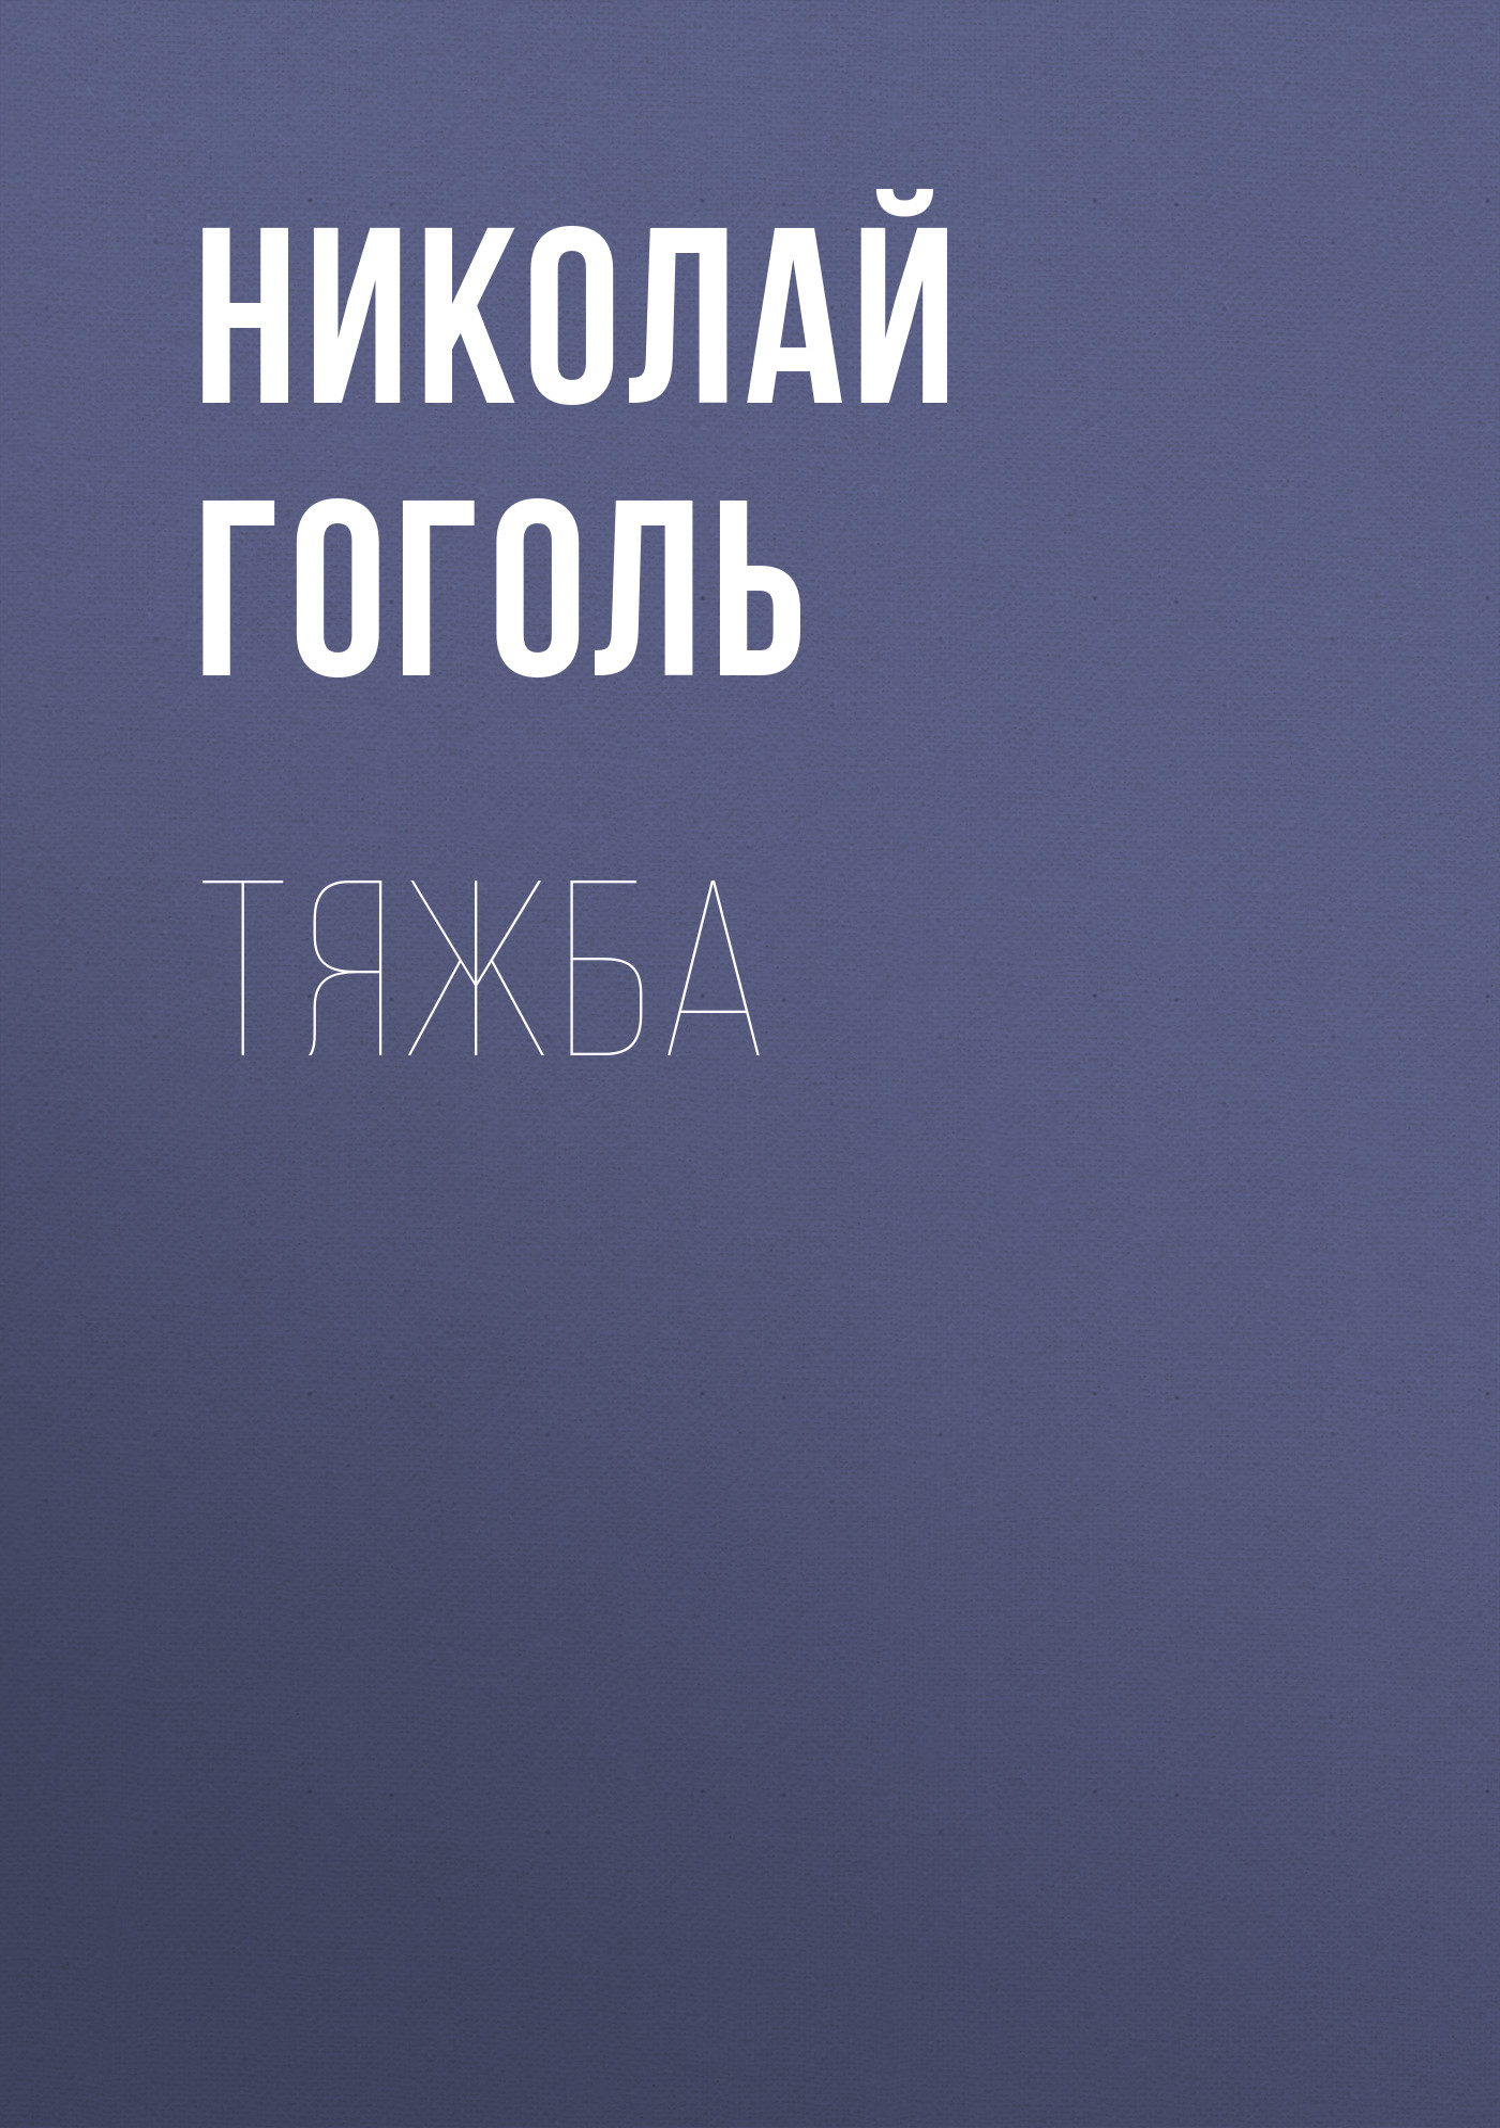 Николай Гоголь Тяжба блокнот printio николай гоголь портрет работы фёдора моллера